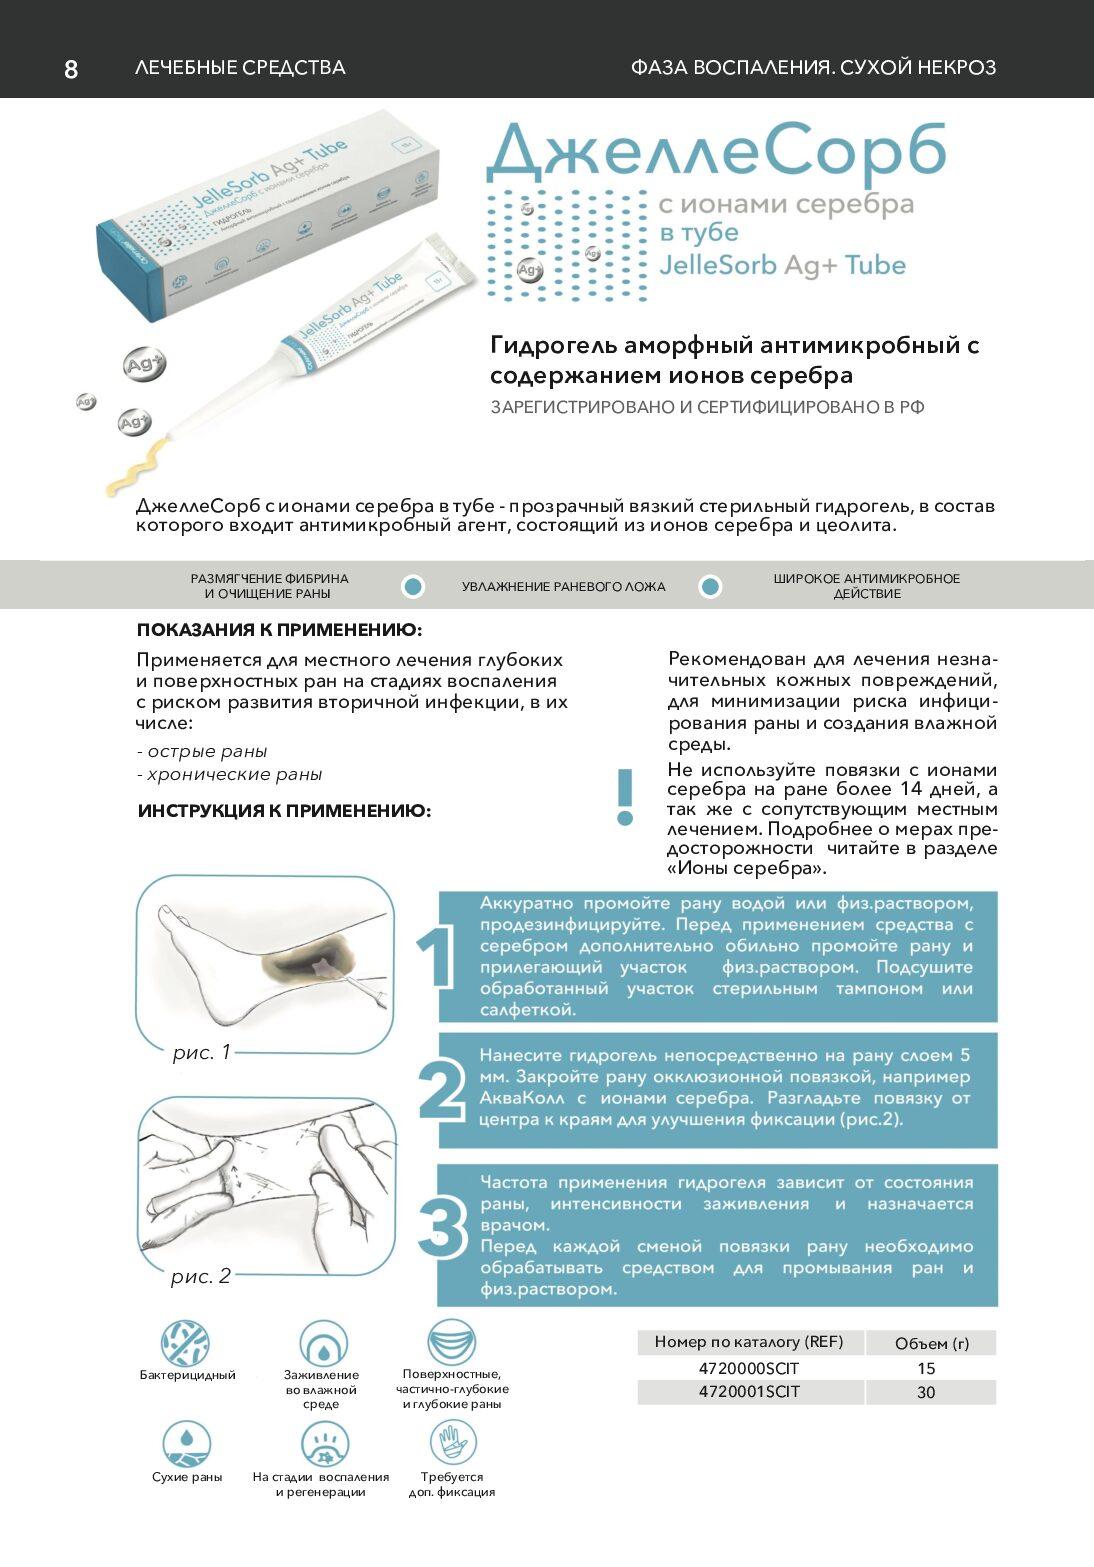 продукции Optimelle2 1 60 8 1 pdf